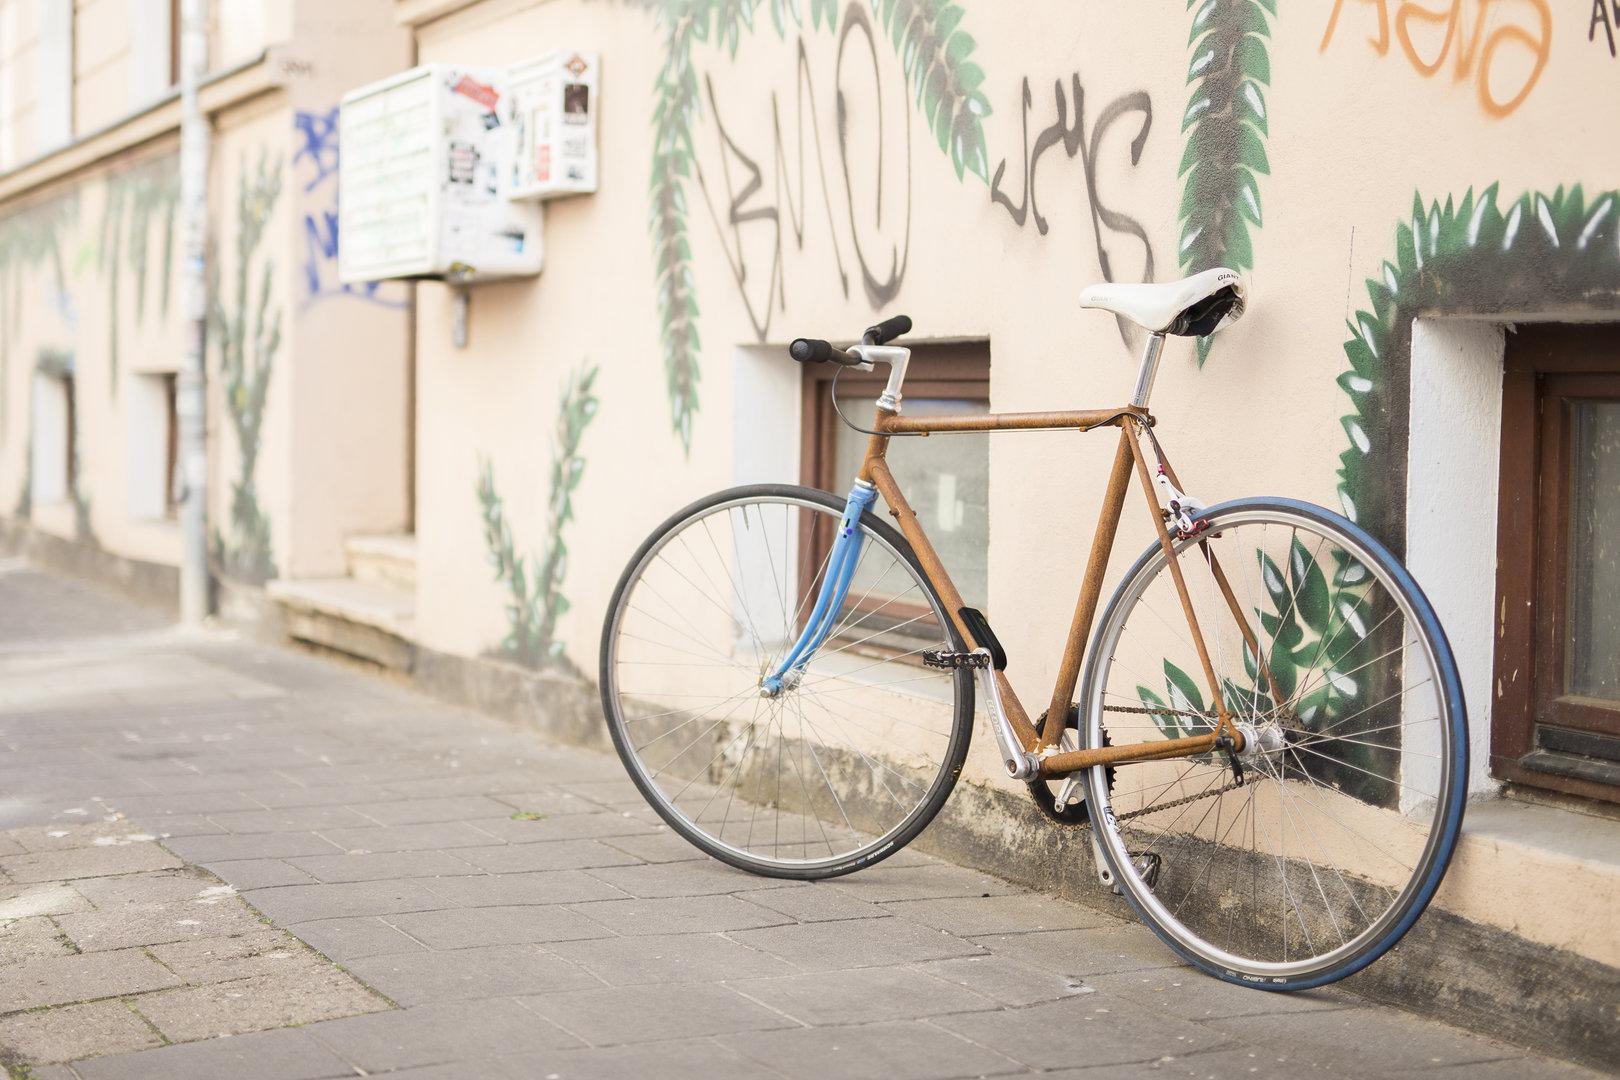 insect montiert am Fahrrad